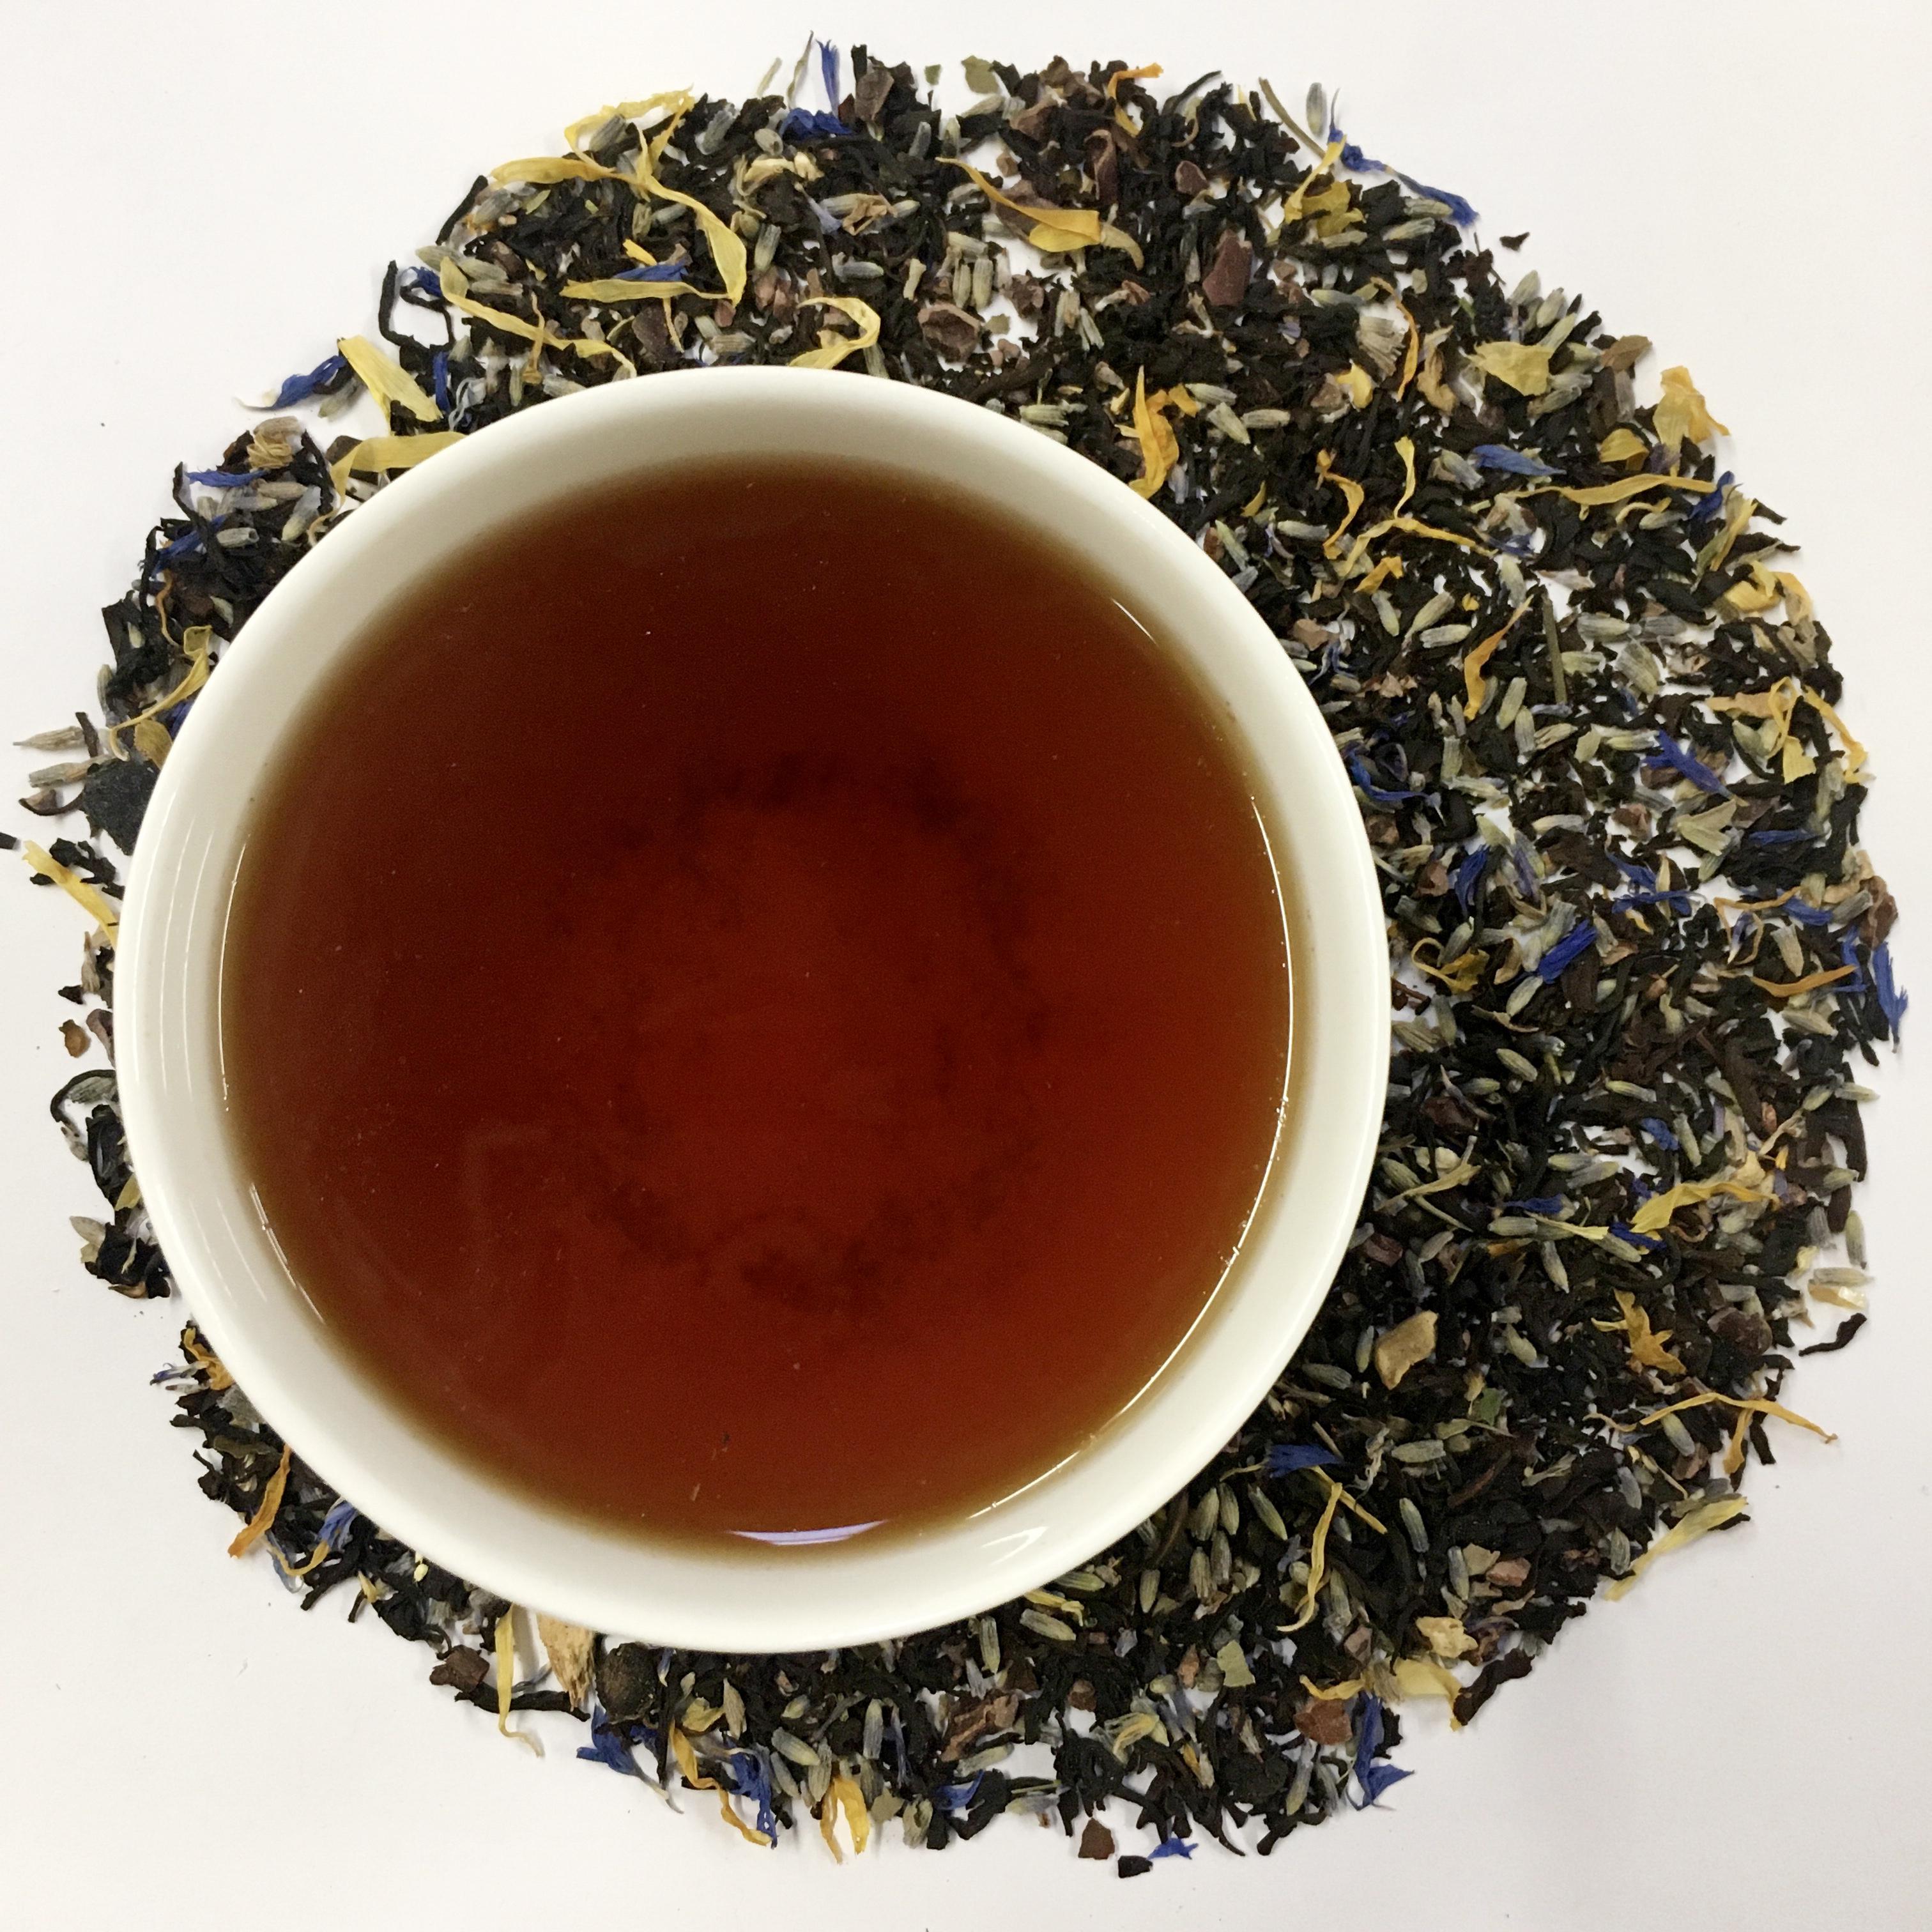 Wild Blueberry (Organic), Black Tea from Ku Cha House of Tea